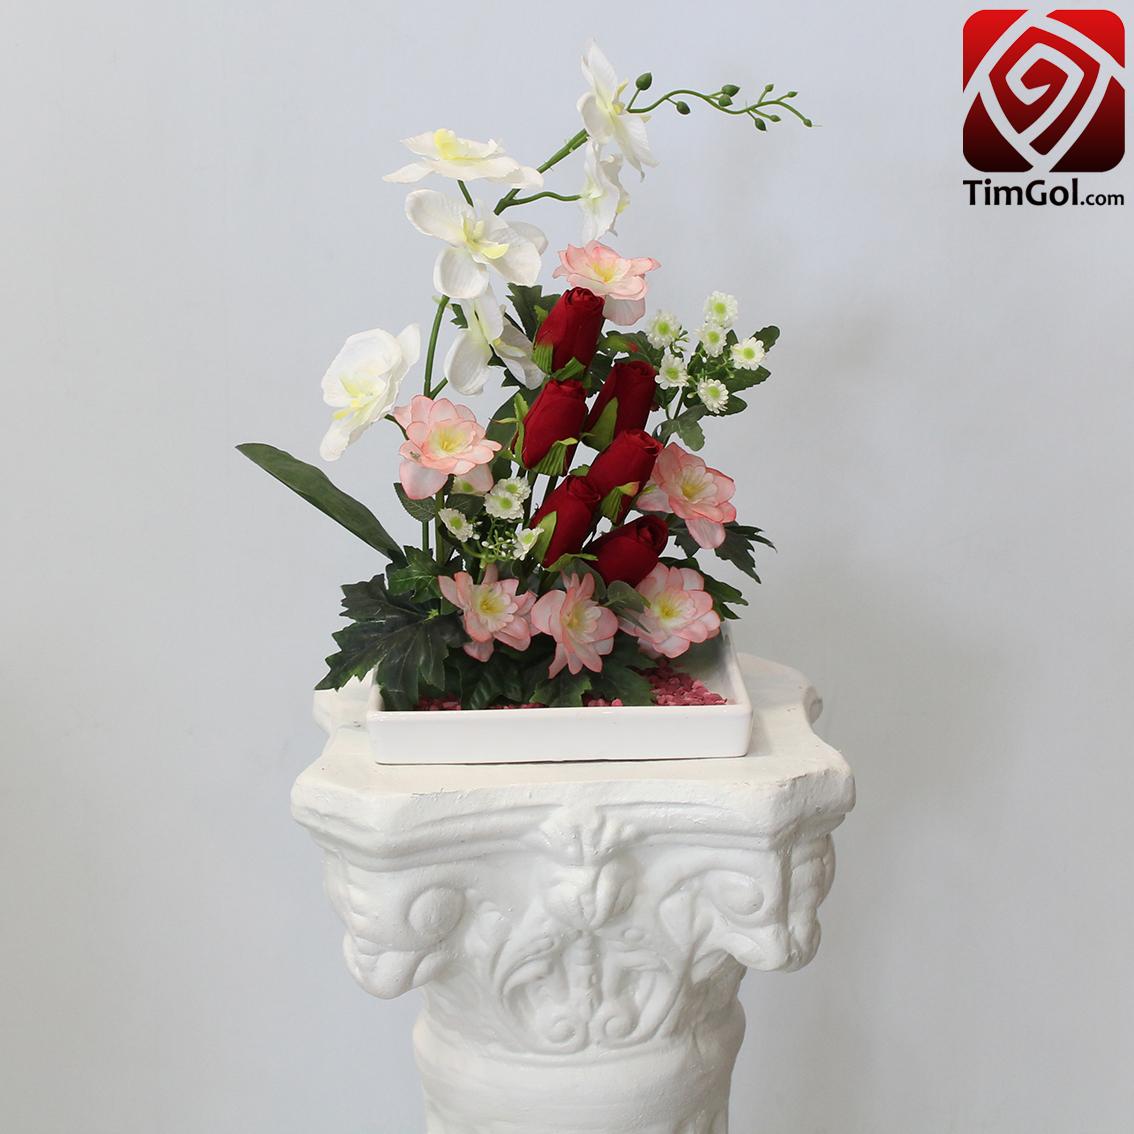 گل مصنوعی غنچه رز و شبو مصنوعی